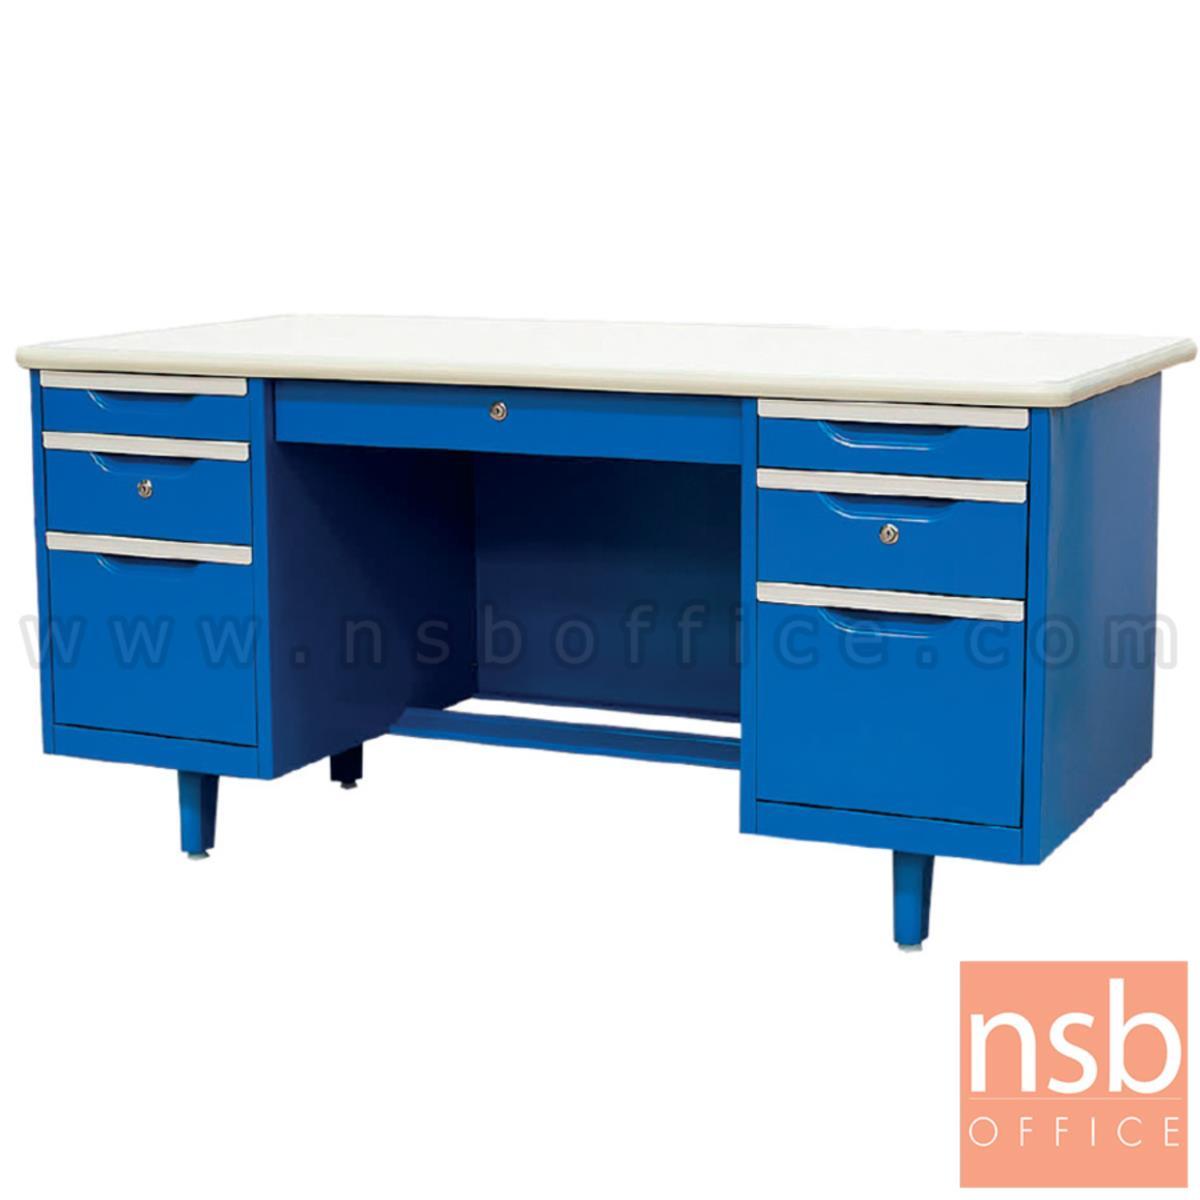 E06A008:โต๊ะทำงานเหล็กหน้าเหล็ก 7 ลิ้นชัก  รุ่น Cillian (คิลเลียน) ขนาด 4.5 ,5 ,6 ฟุต